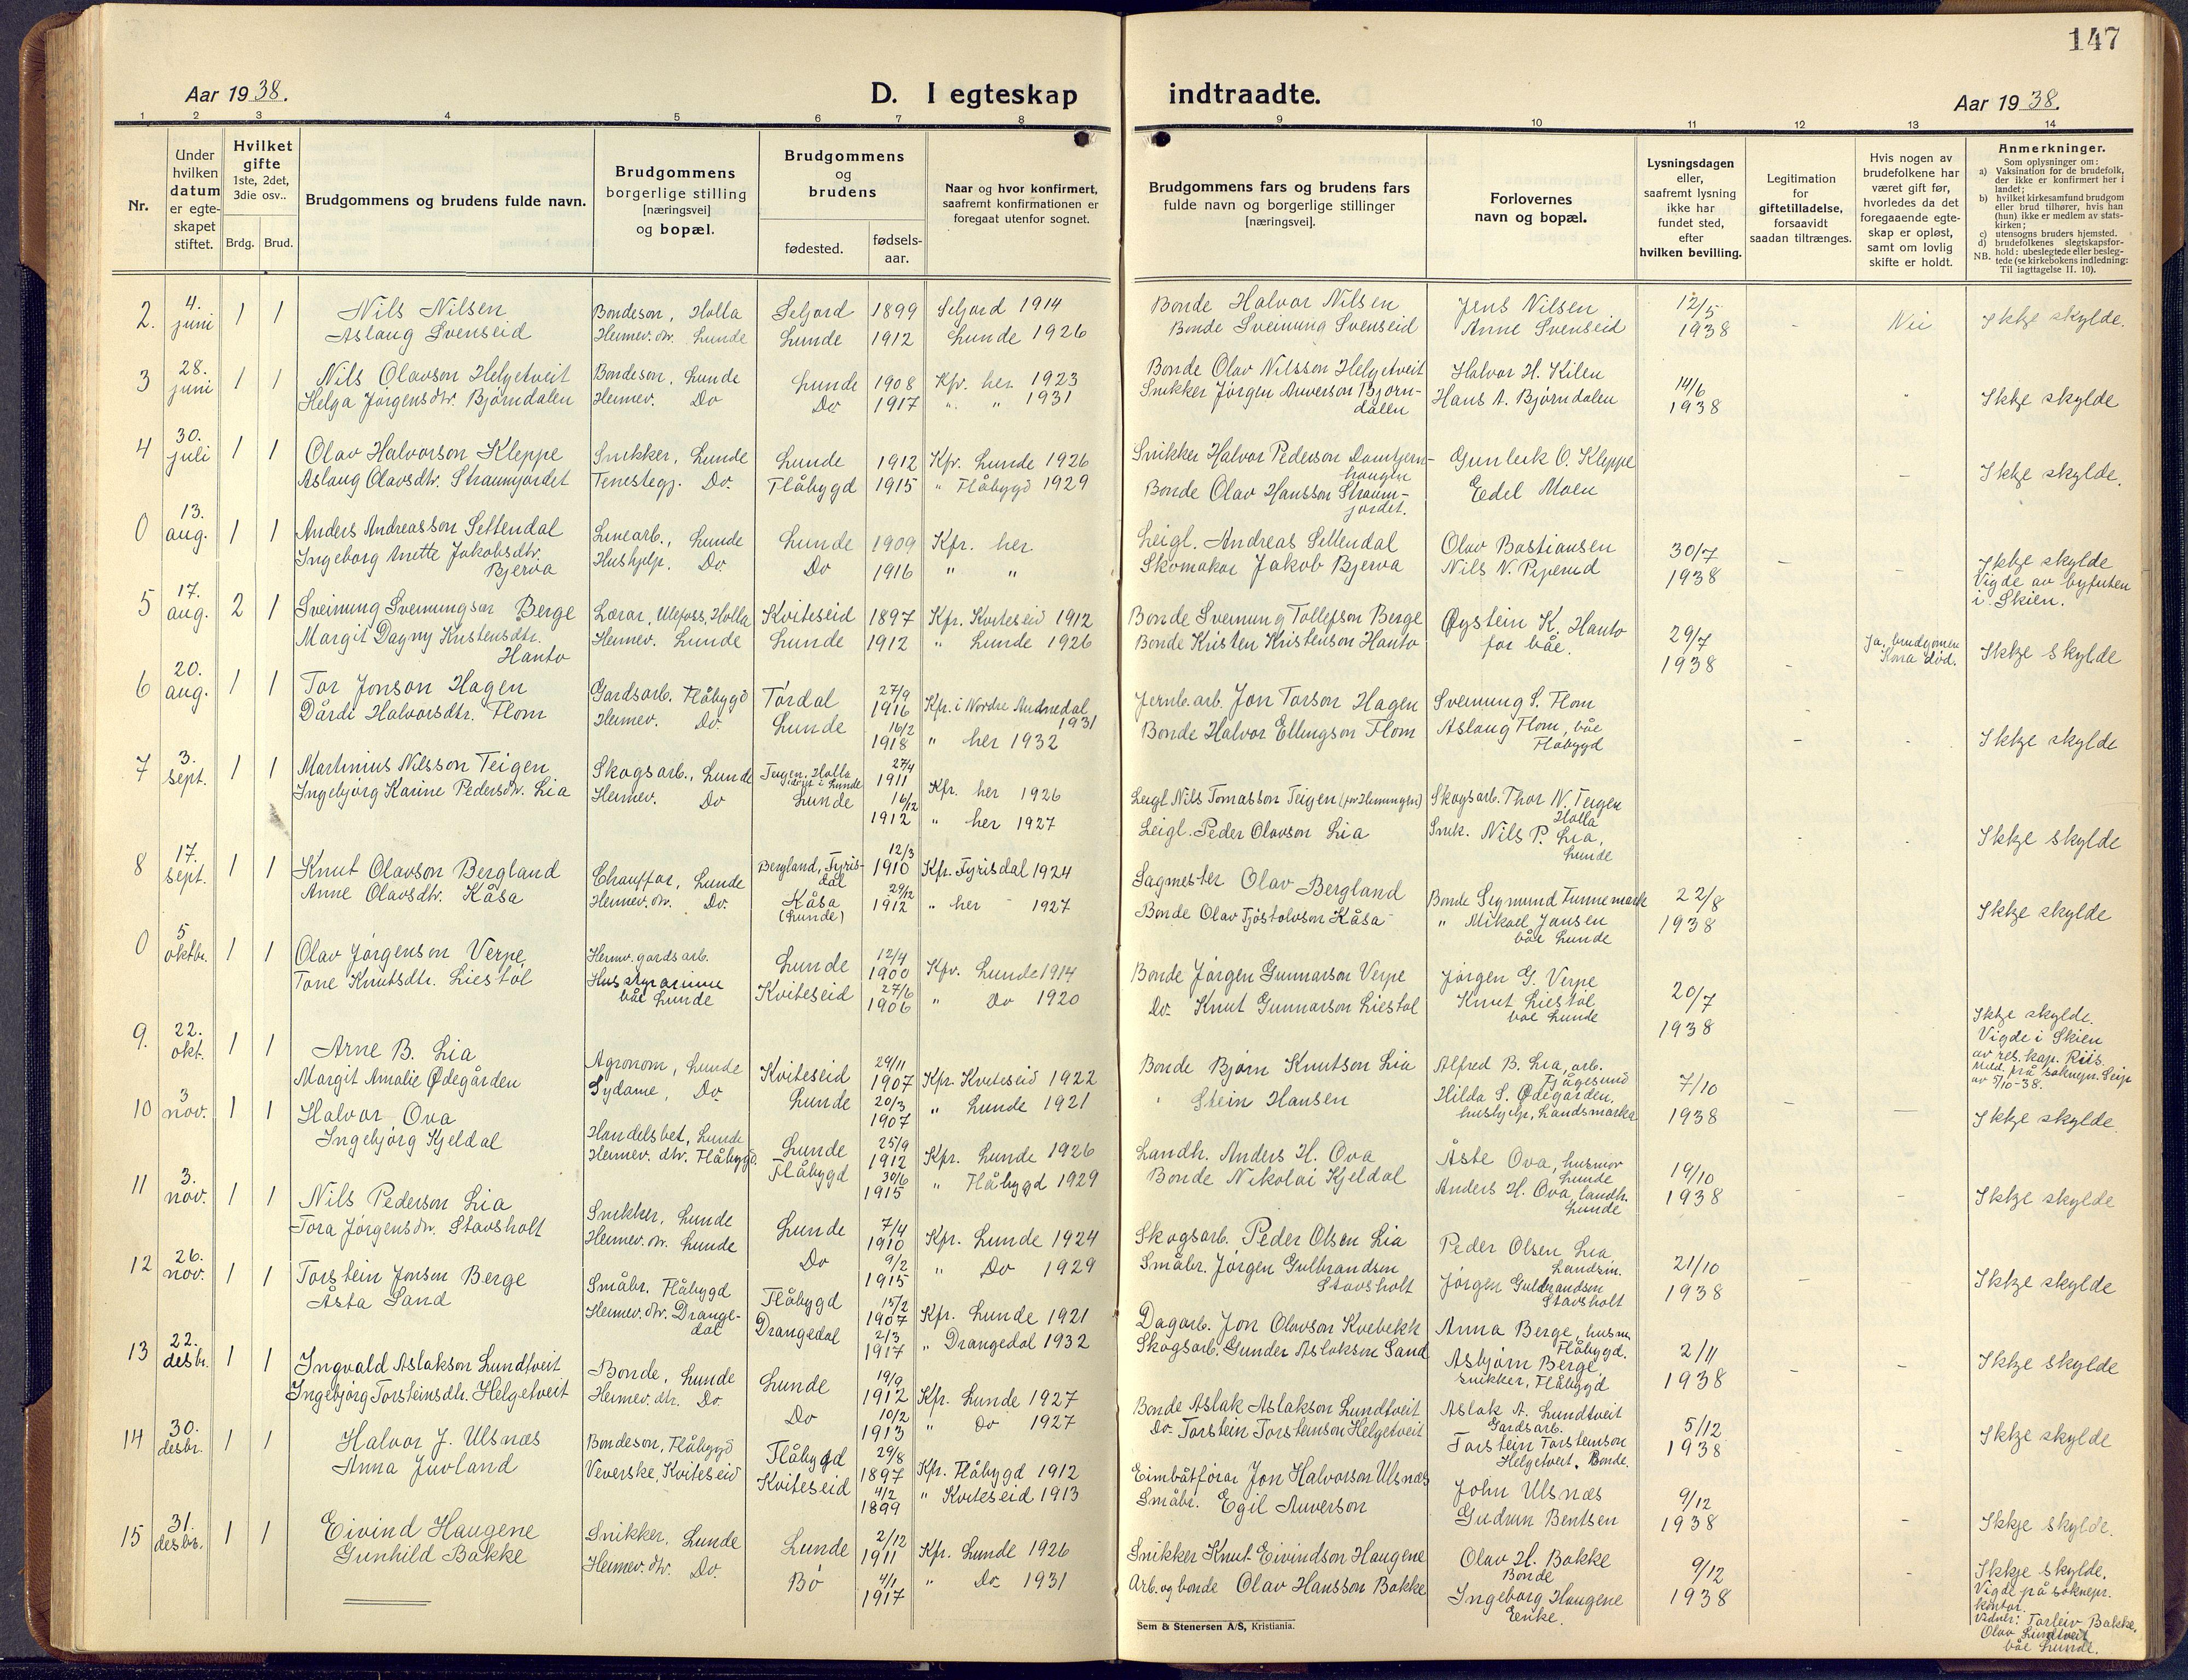 SAKO, Lunde kirkebøker, F/Fa/L0006: Ministerialbok nr. I 6, 1922-1940, s. 147